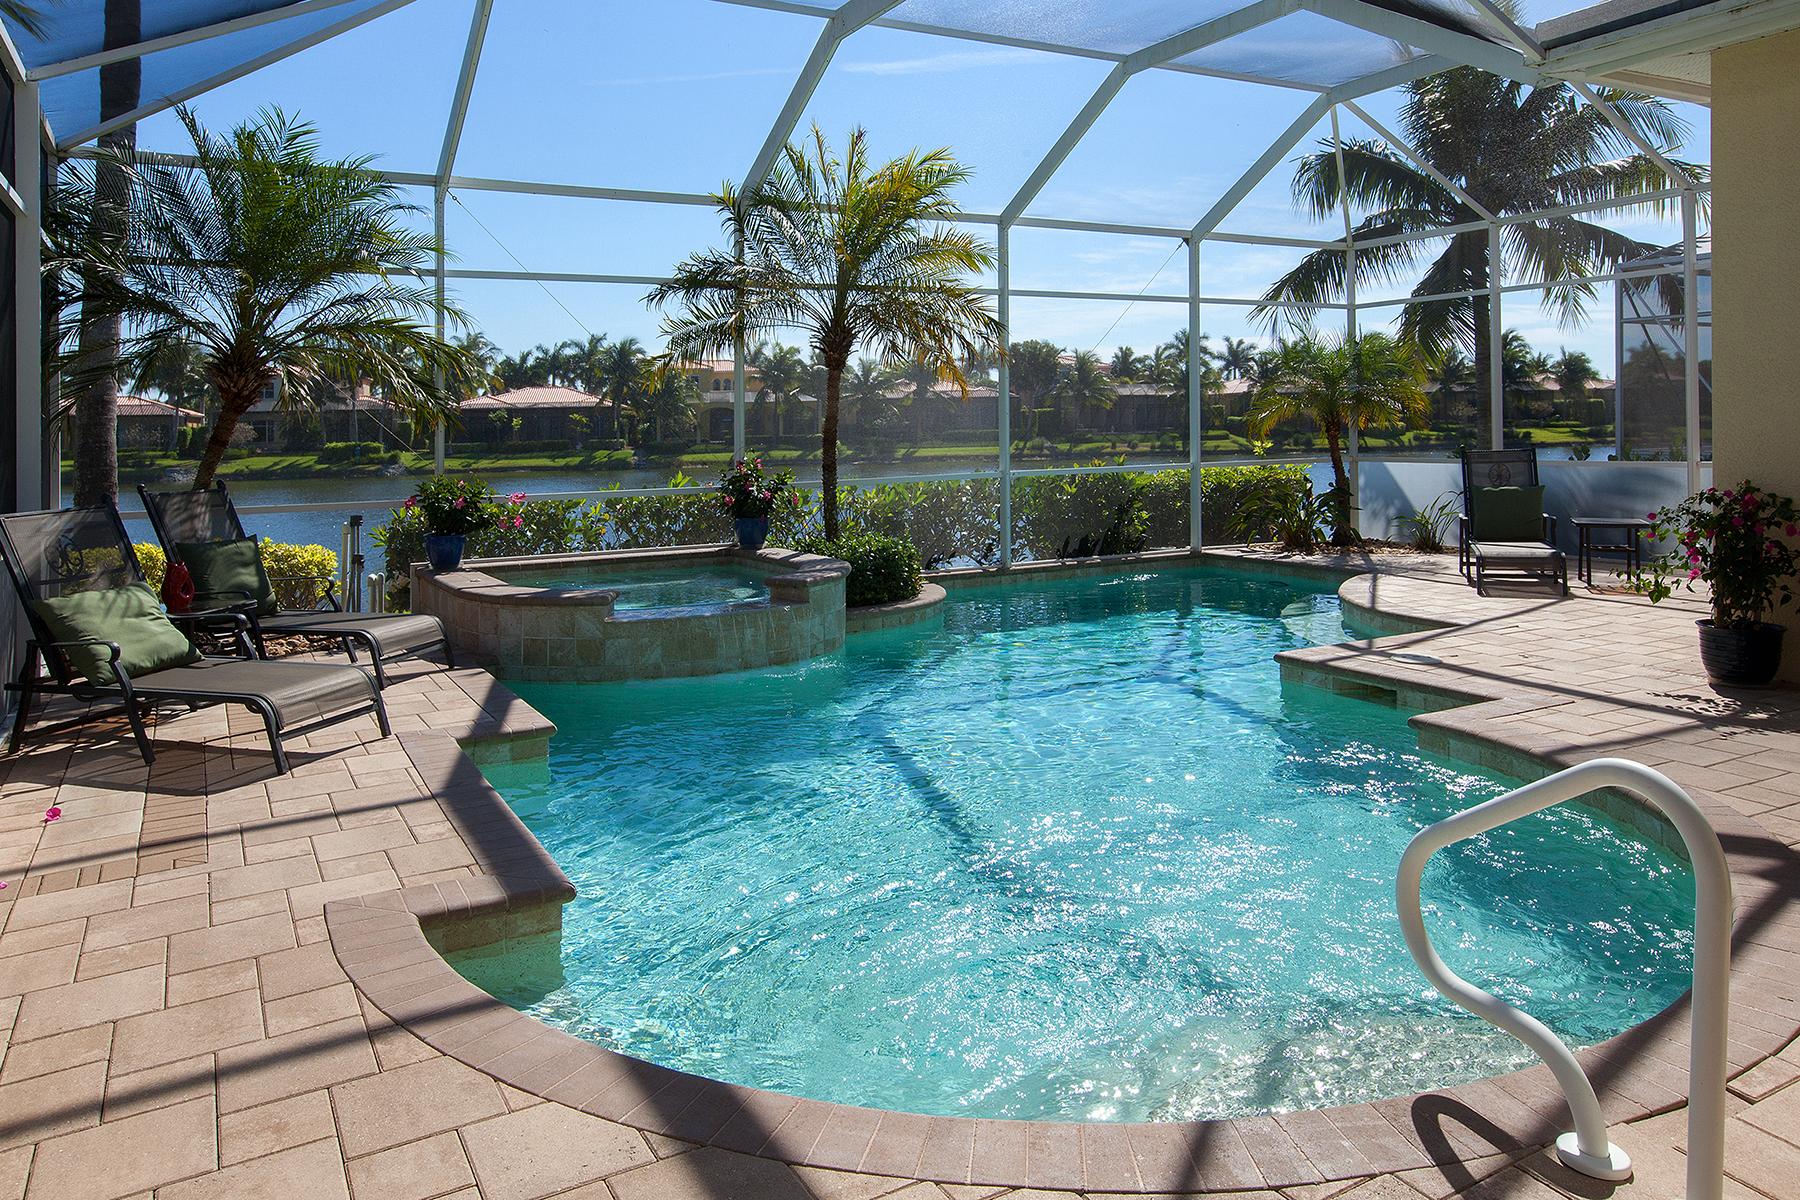 Single Family Home for Sale at FIDDLER'S CREEK - MALLARD'S LANDING 8520 Mallards Pt Naples, Florida, 34114 United States